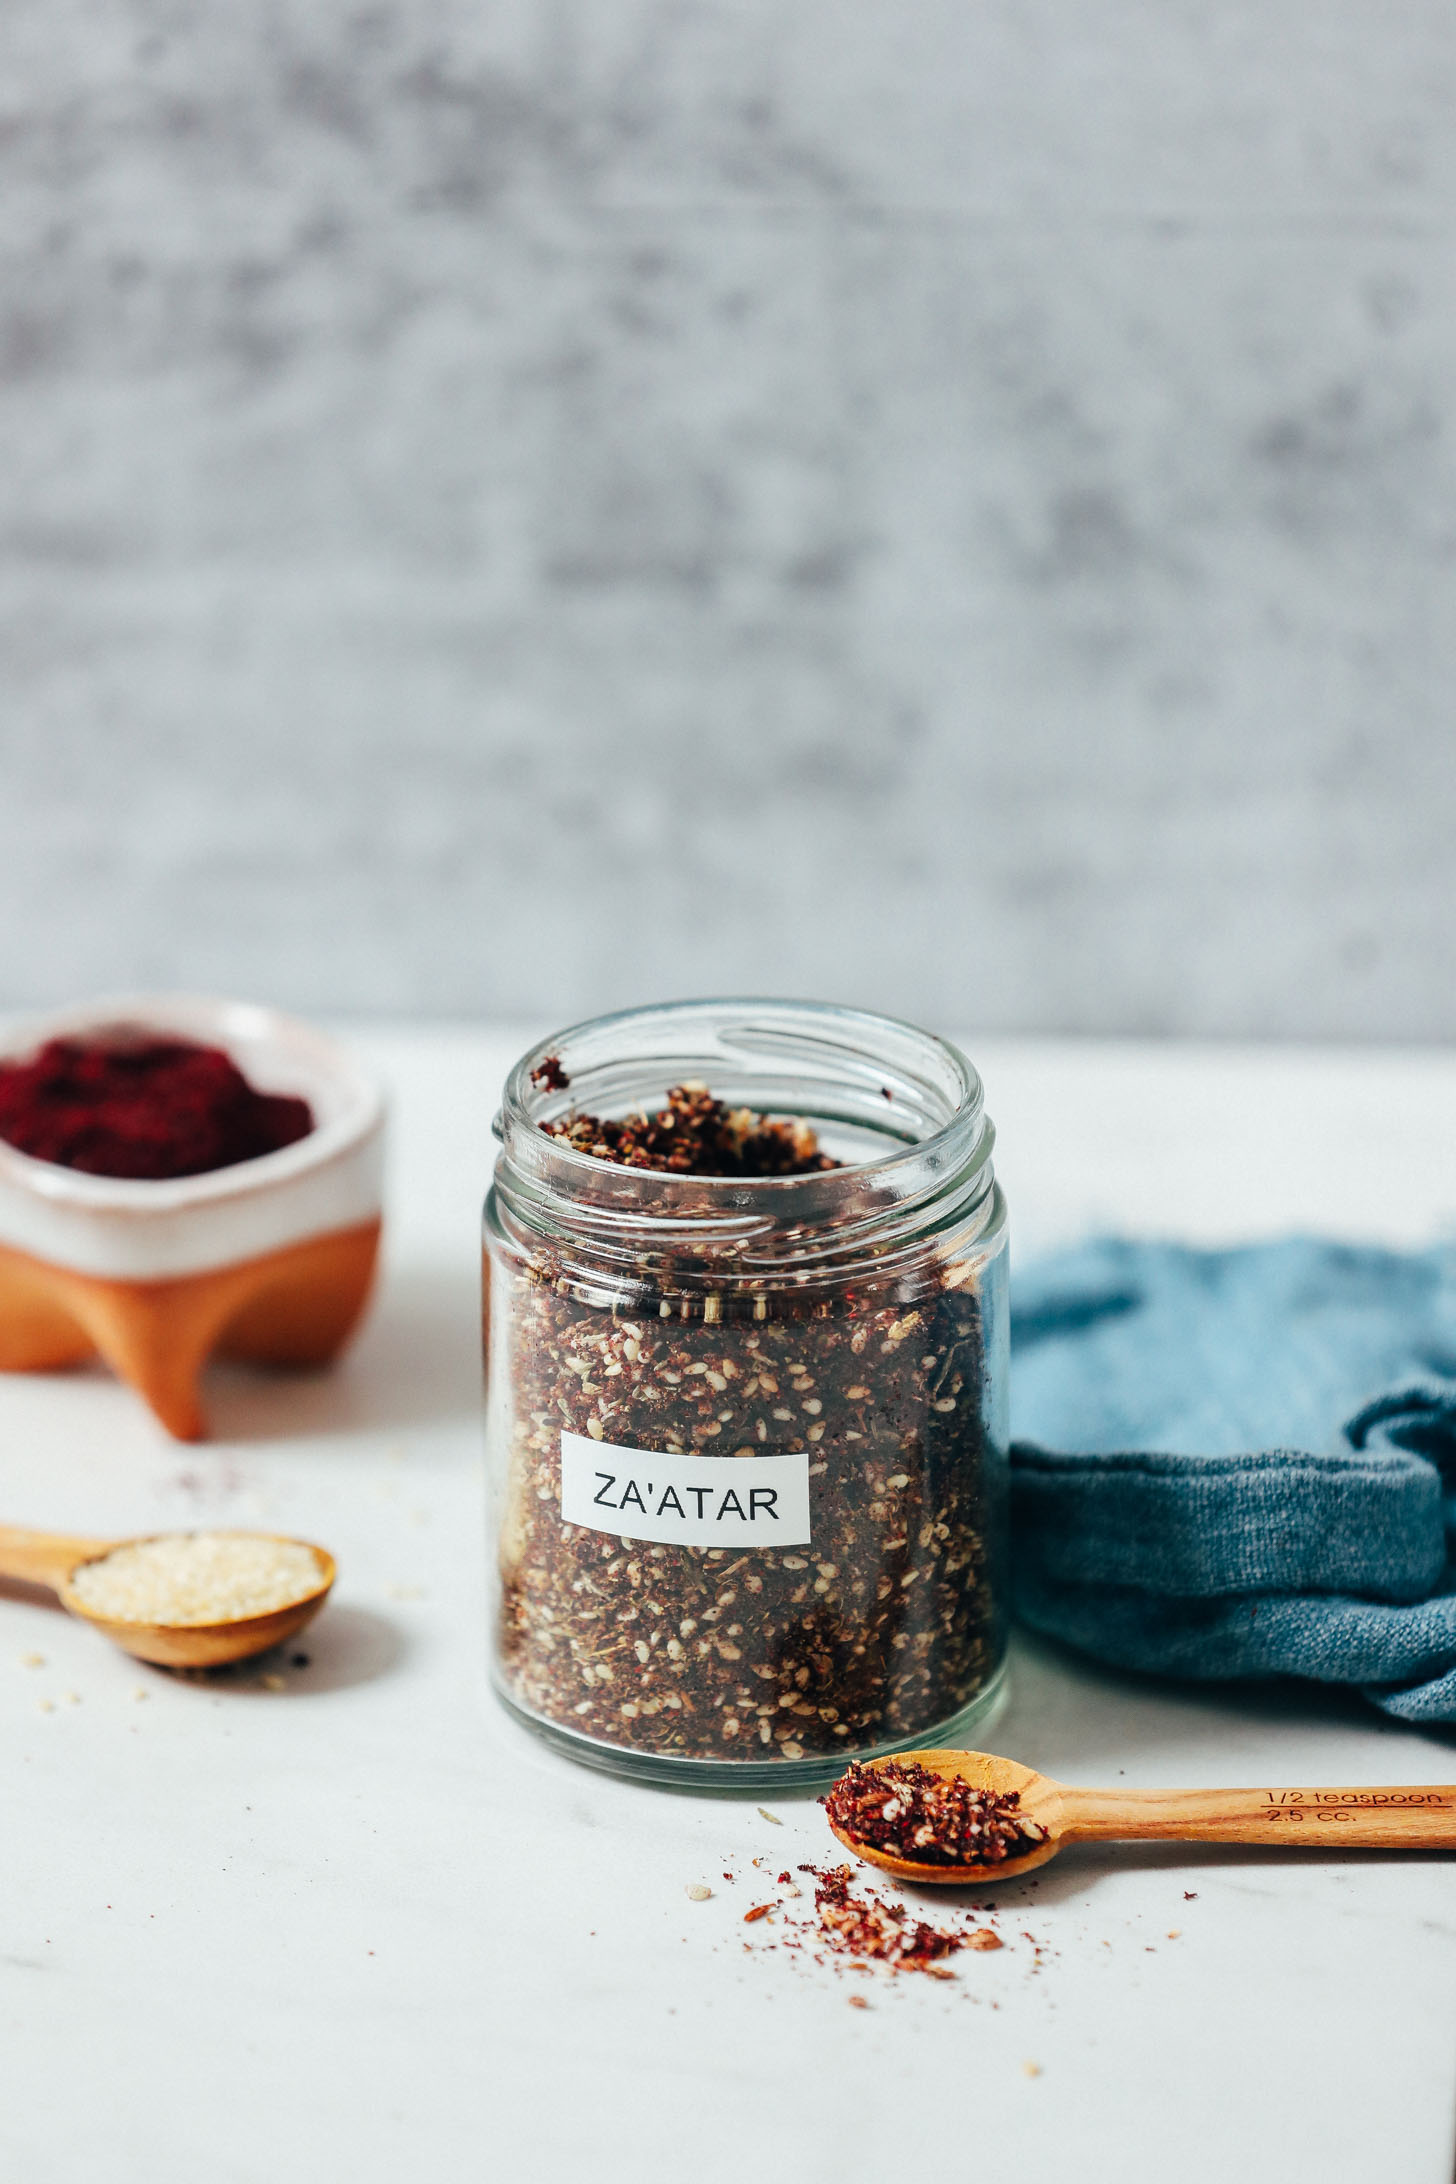 Spoonful and jar of za'atar seasoning next to sesame seeds and sumac